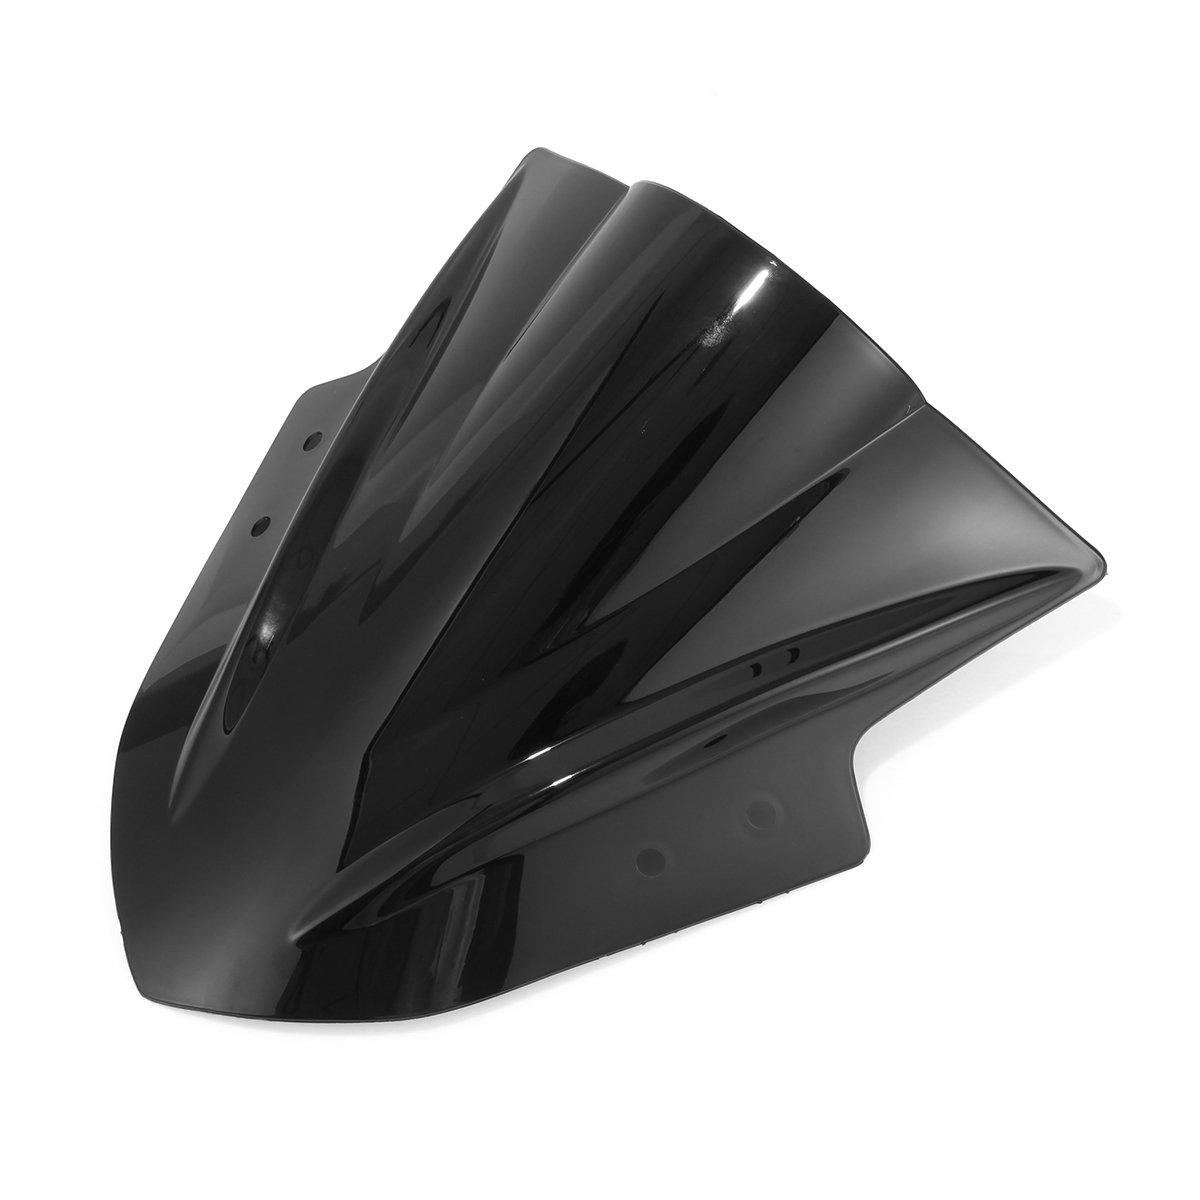 NEVERLAND Double Bubble Windshield WindScreen for Kawasaki Ninja 300 EX300 2013-2015 Black